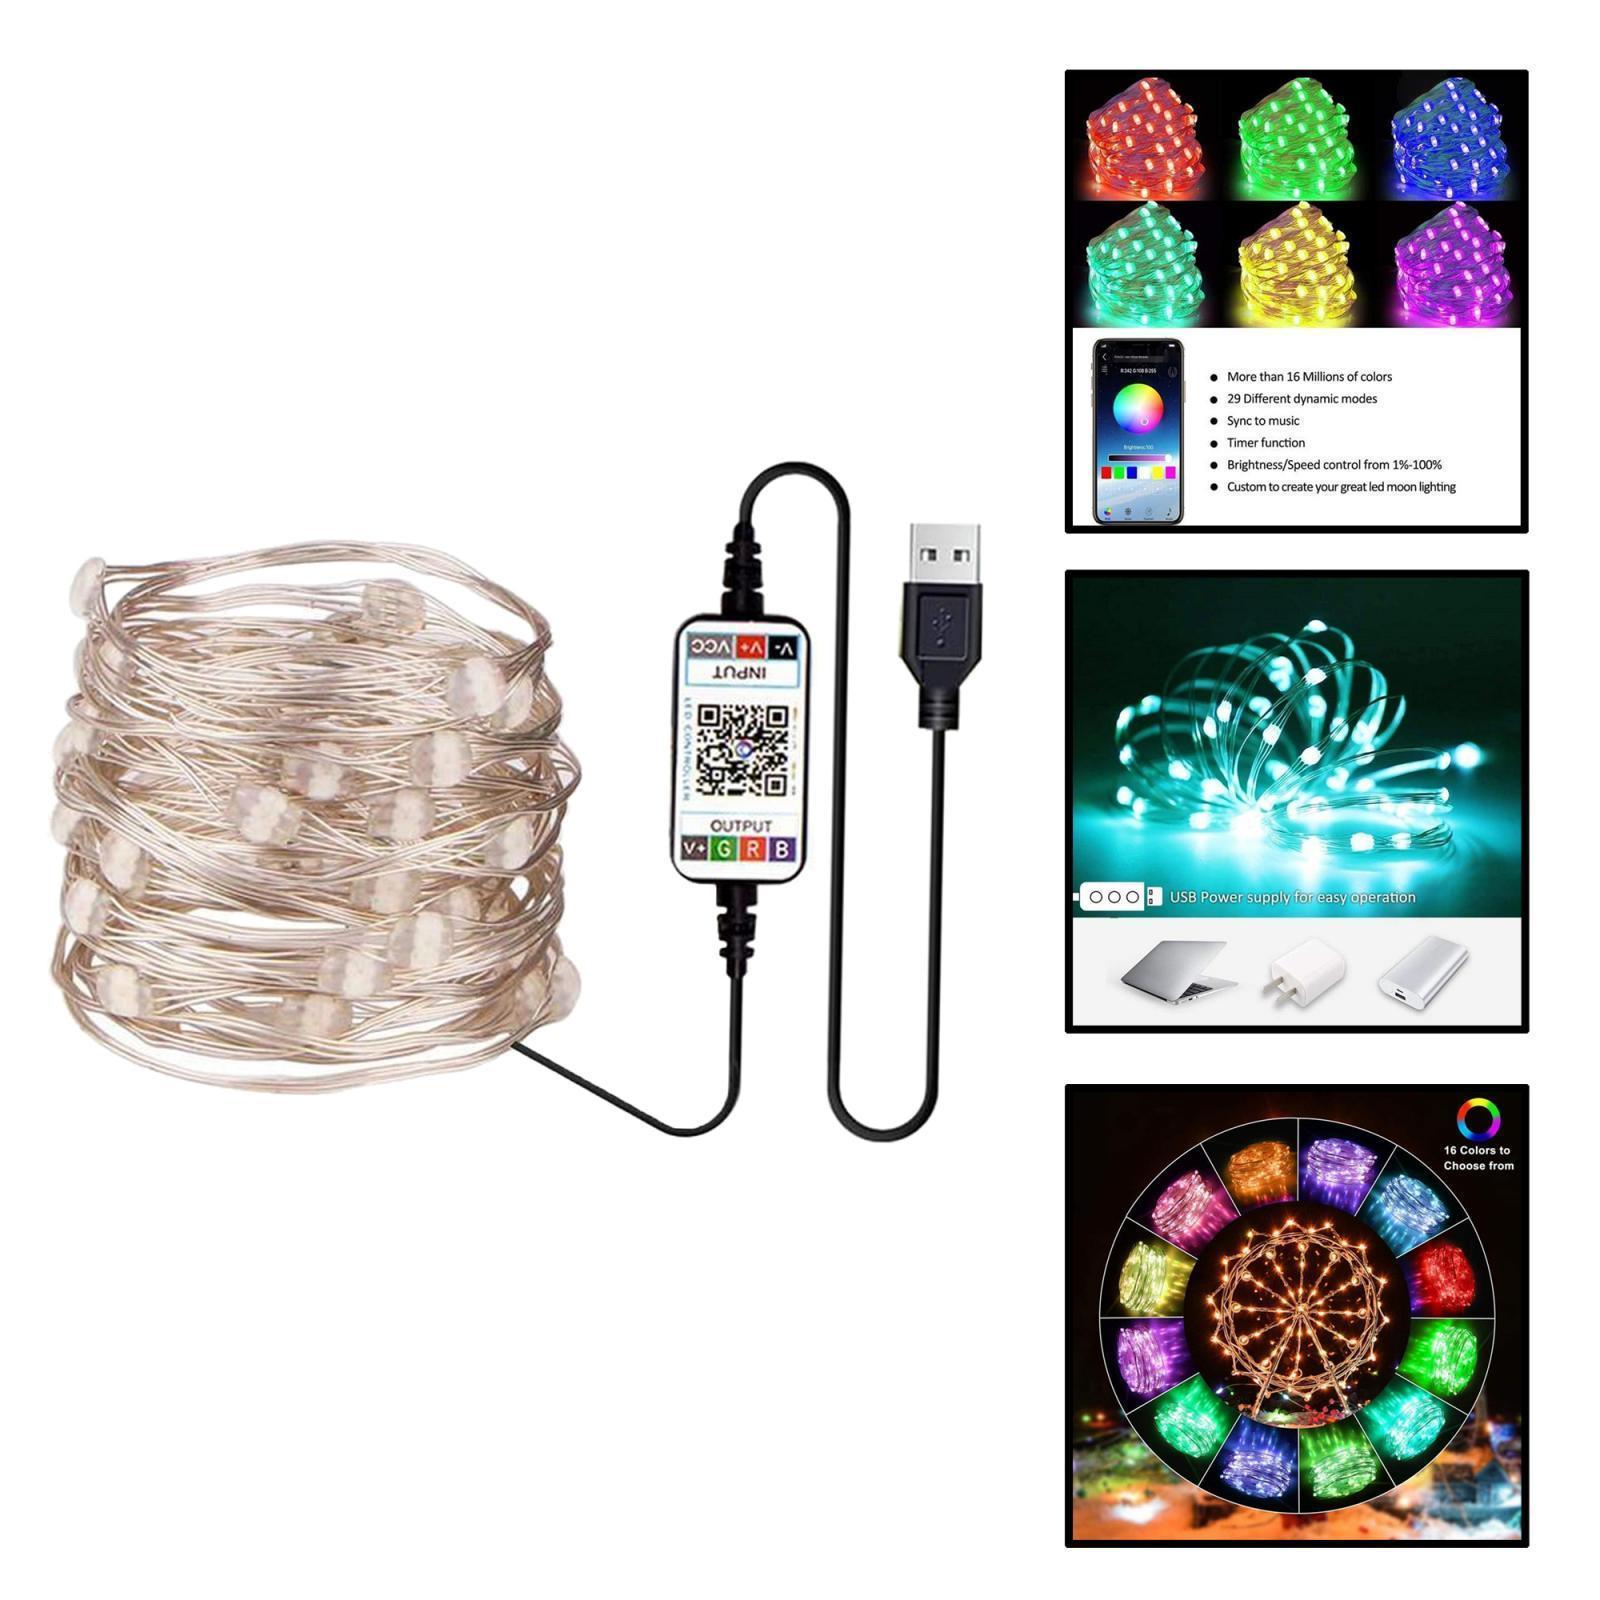 miniature 32 - LED Fée Guirlande Lumineuse Rideau Fenêtre De Mariage Party Decor App Contrôl